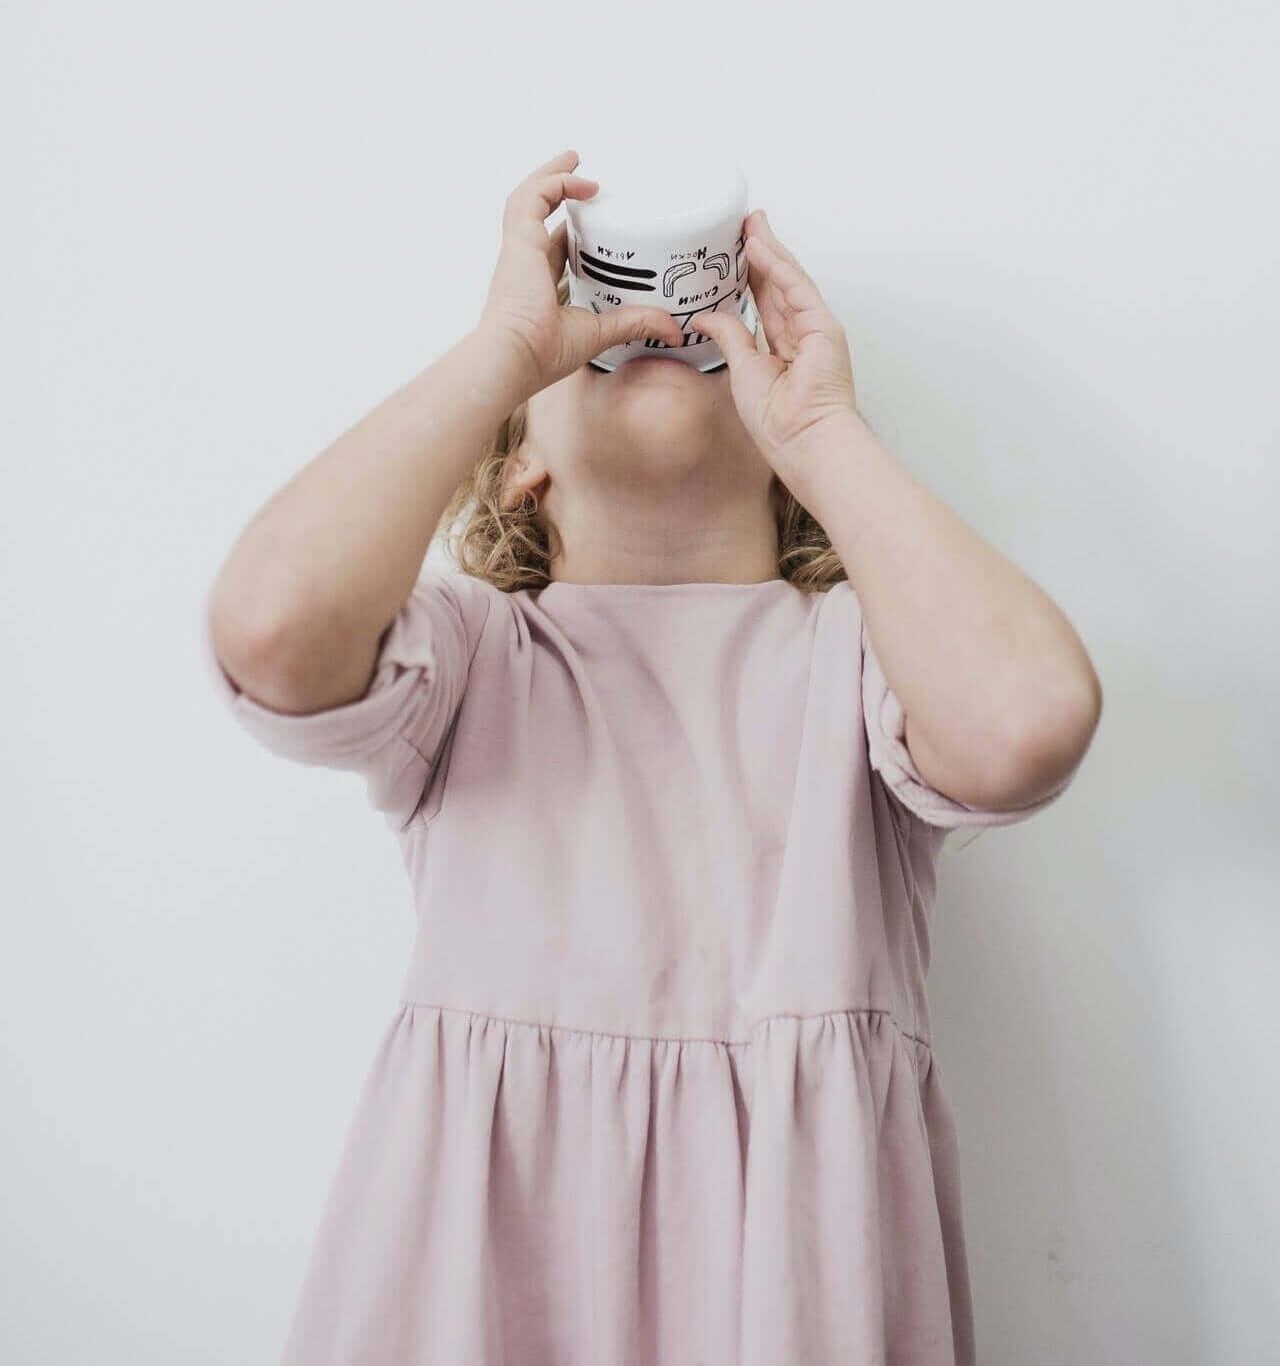 A young girl drinking yogurt.